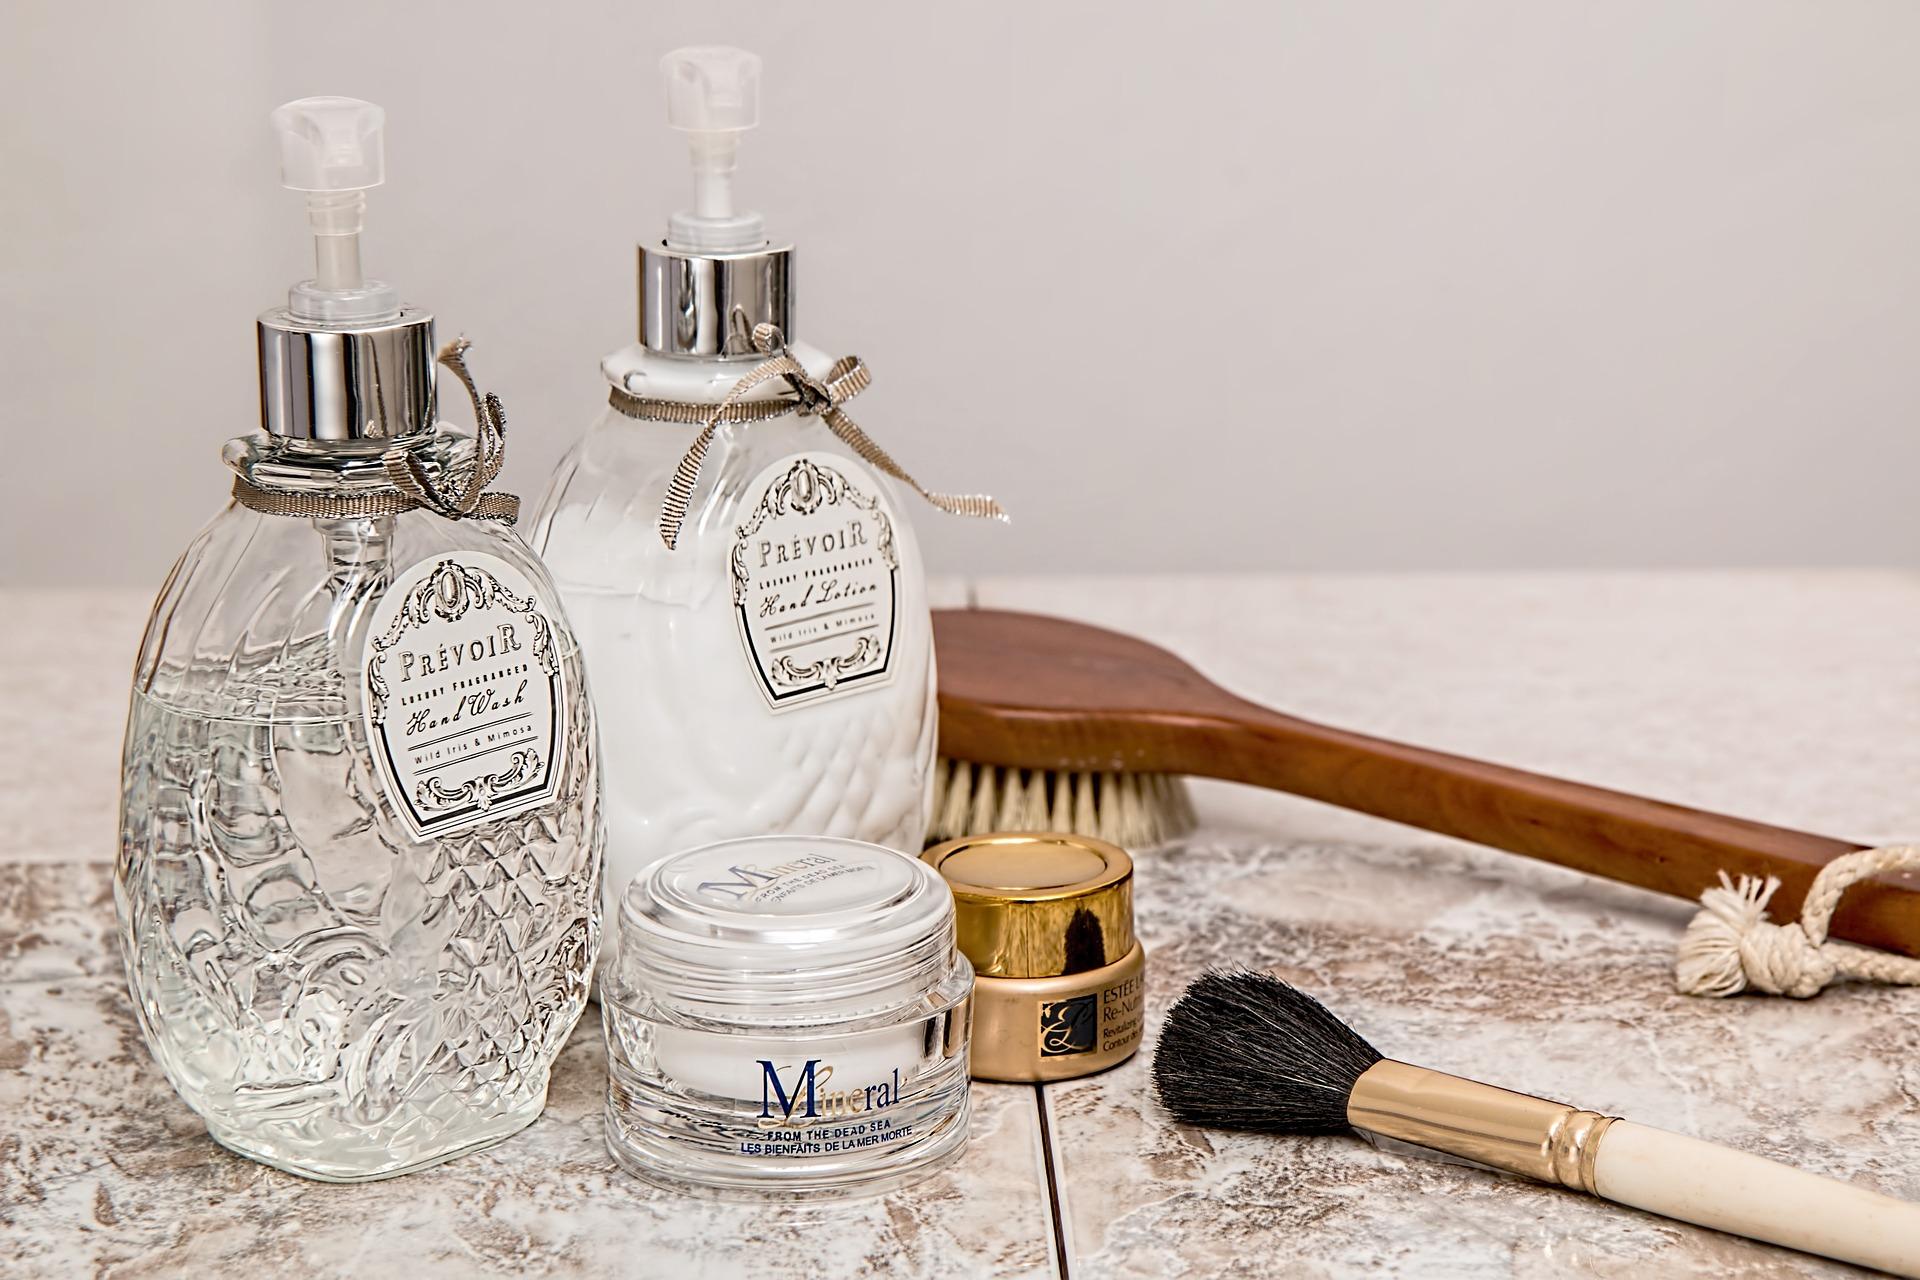 hygiene-870763_1920